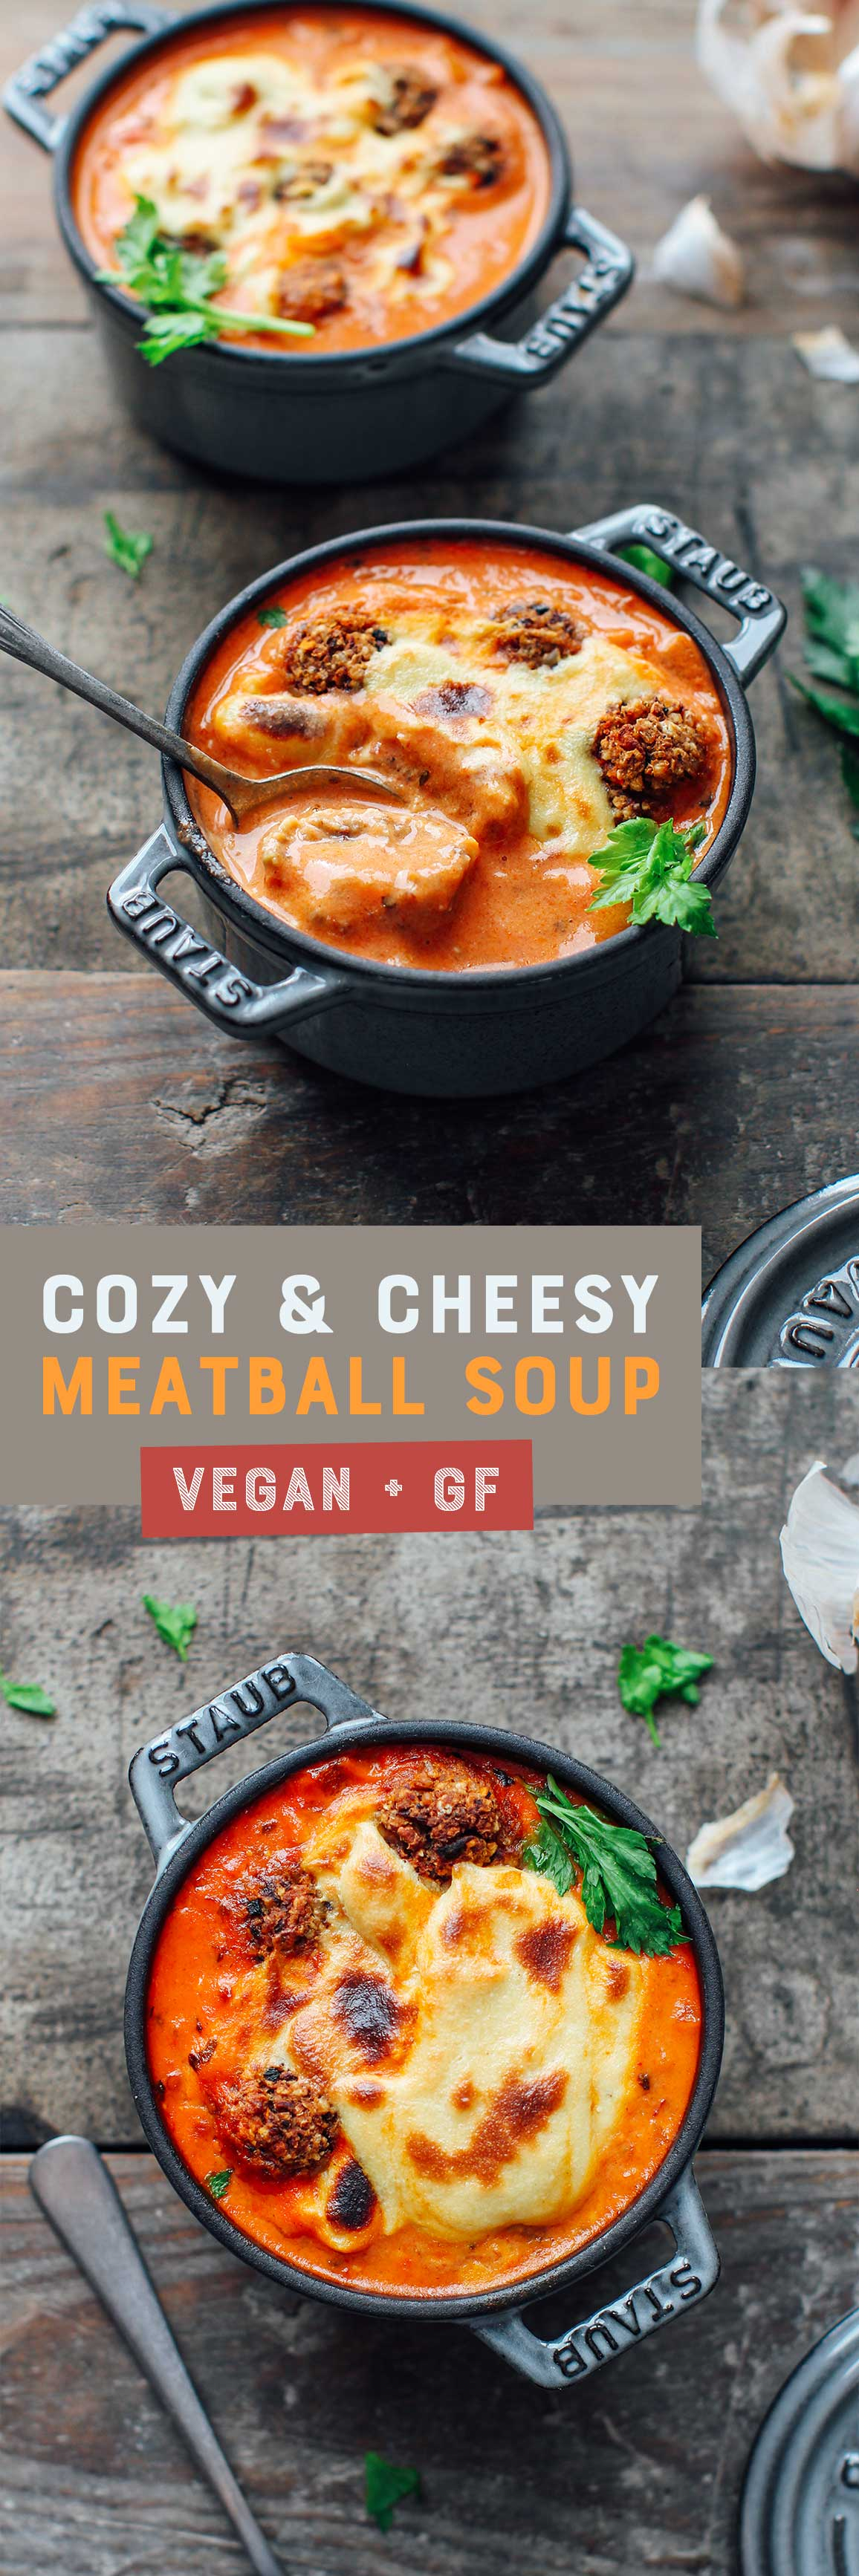 Cozy & Cheesy Vegan Meatball Soup